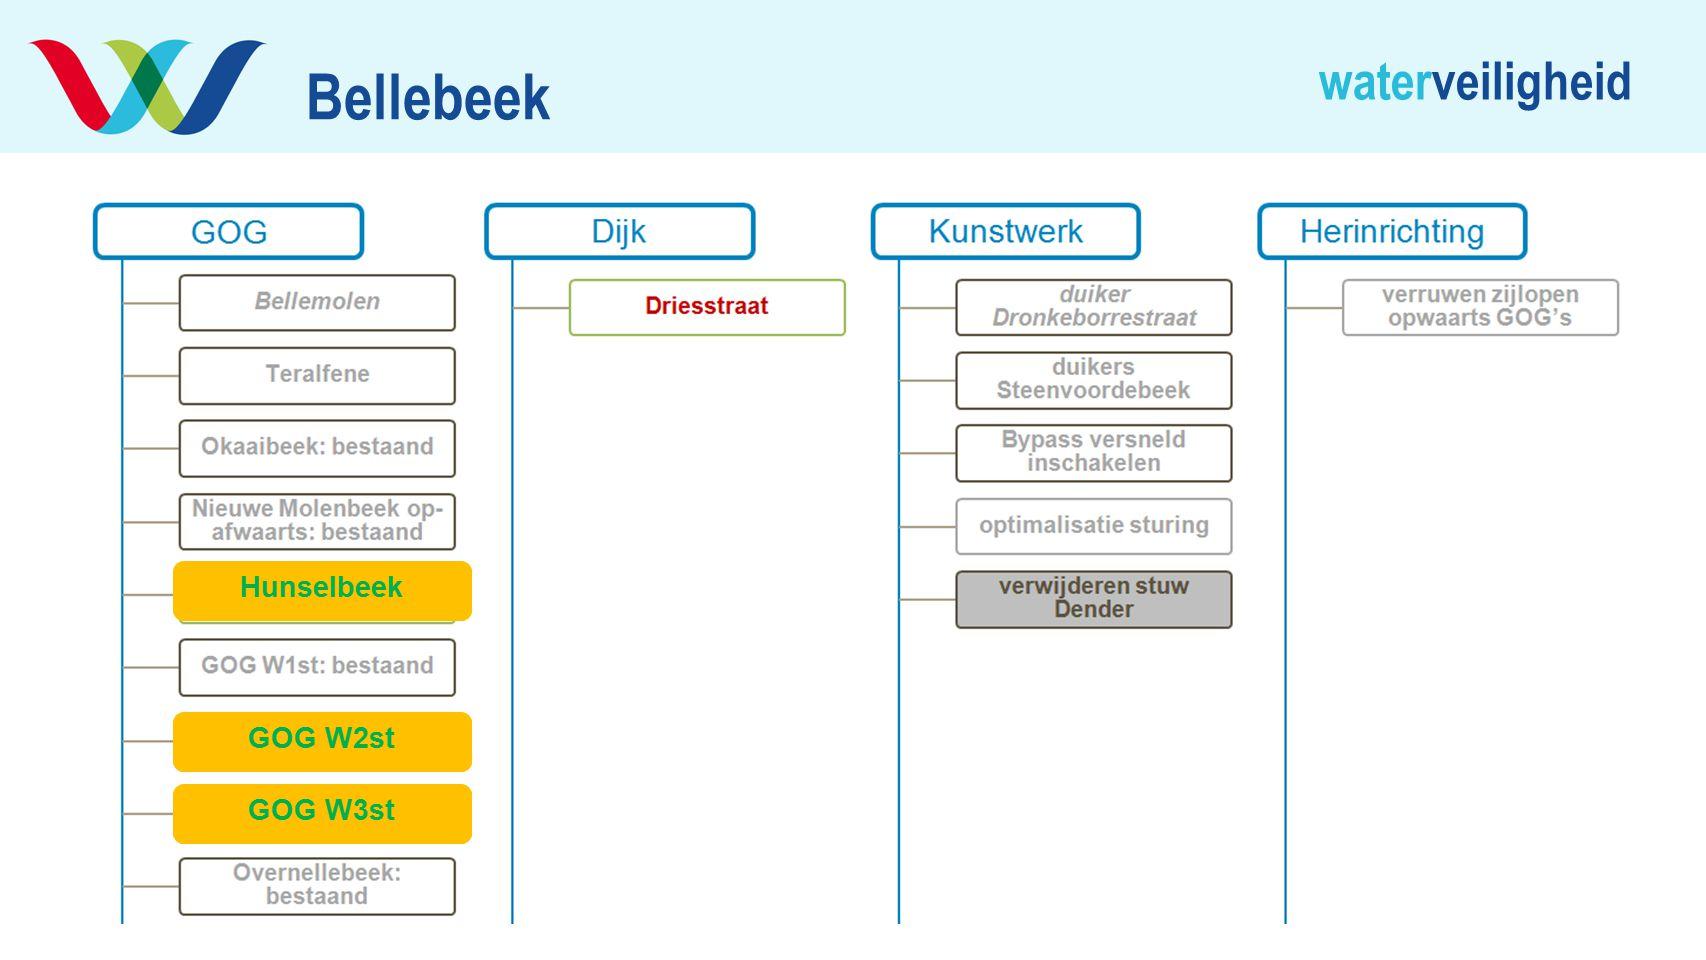 Bellebeek Hunselbeek GOG W2st GOG W3st